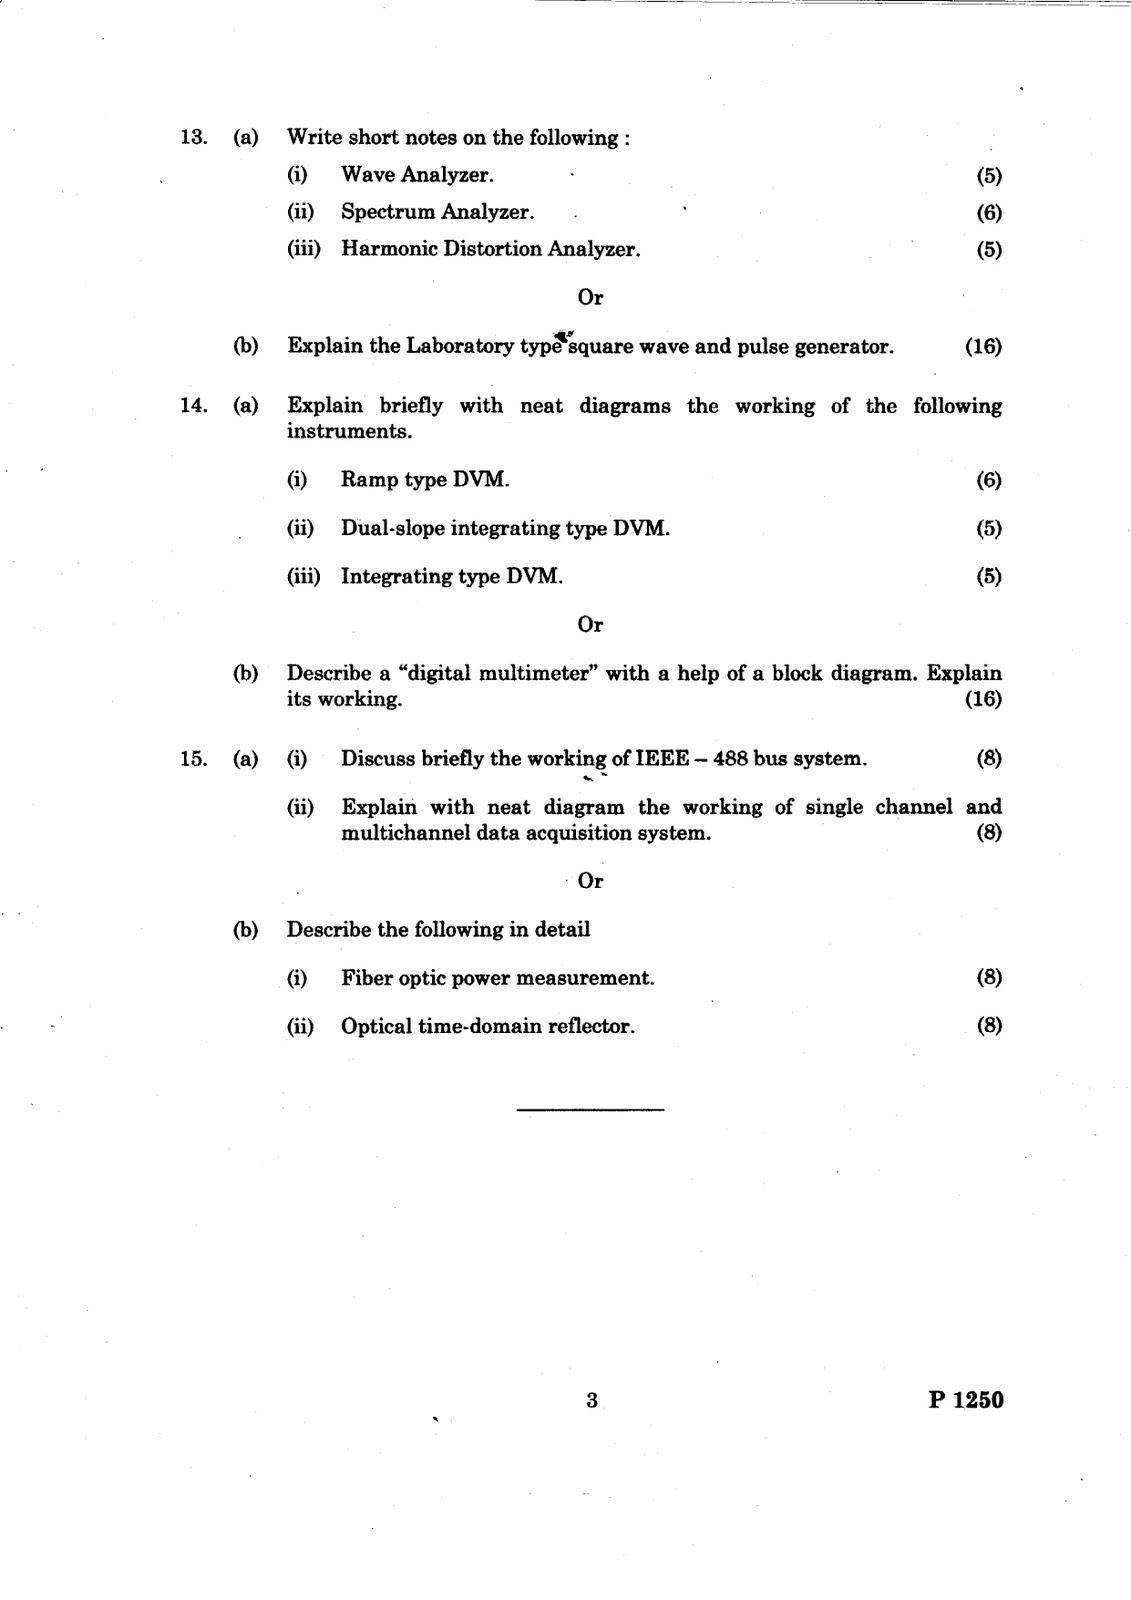 ANNA UNIVERSITY QUESTION BANK: MEASUREMENT AND INSTRUMENTATION